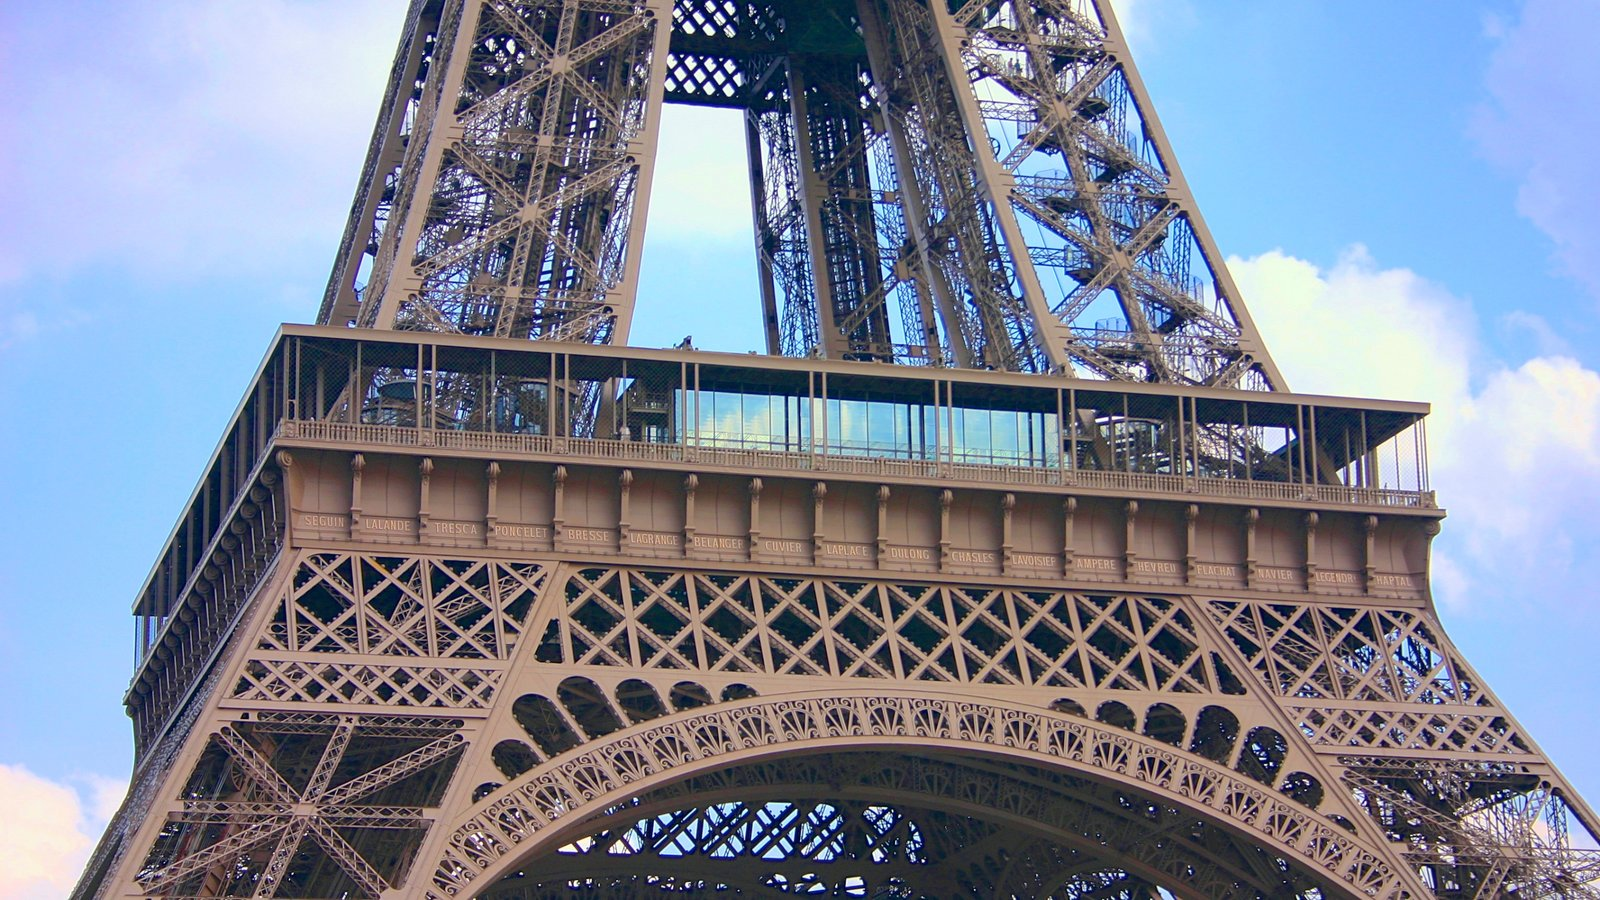 Torre Eiffel caracterizando um monumento